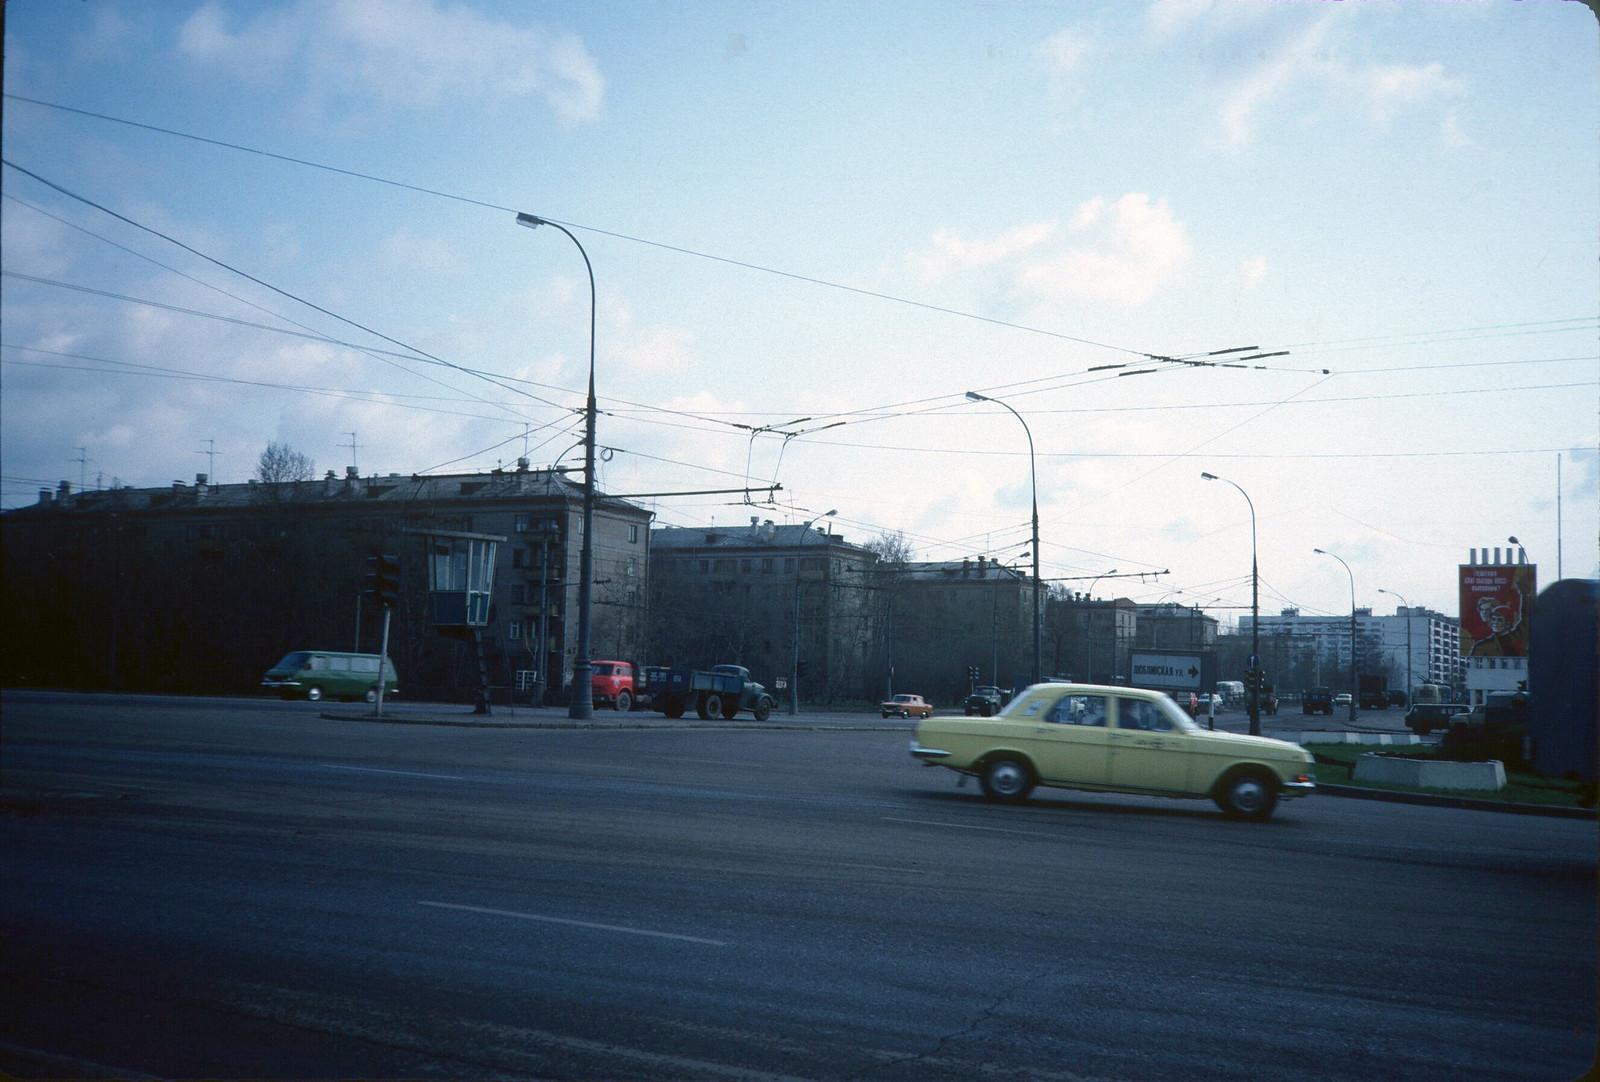 Волгоградский проспект - Люблинская ул.